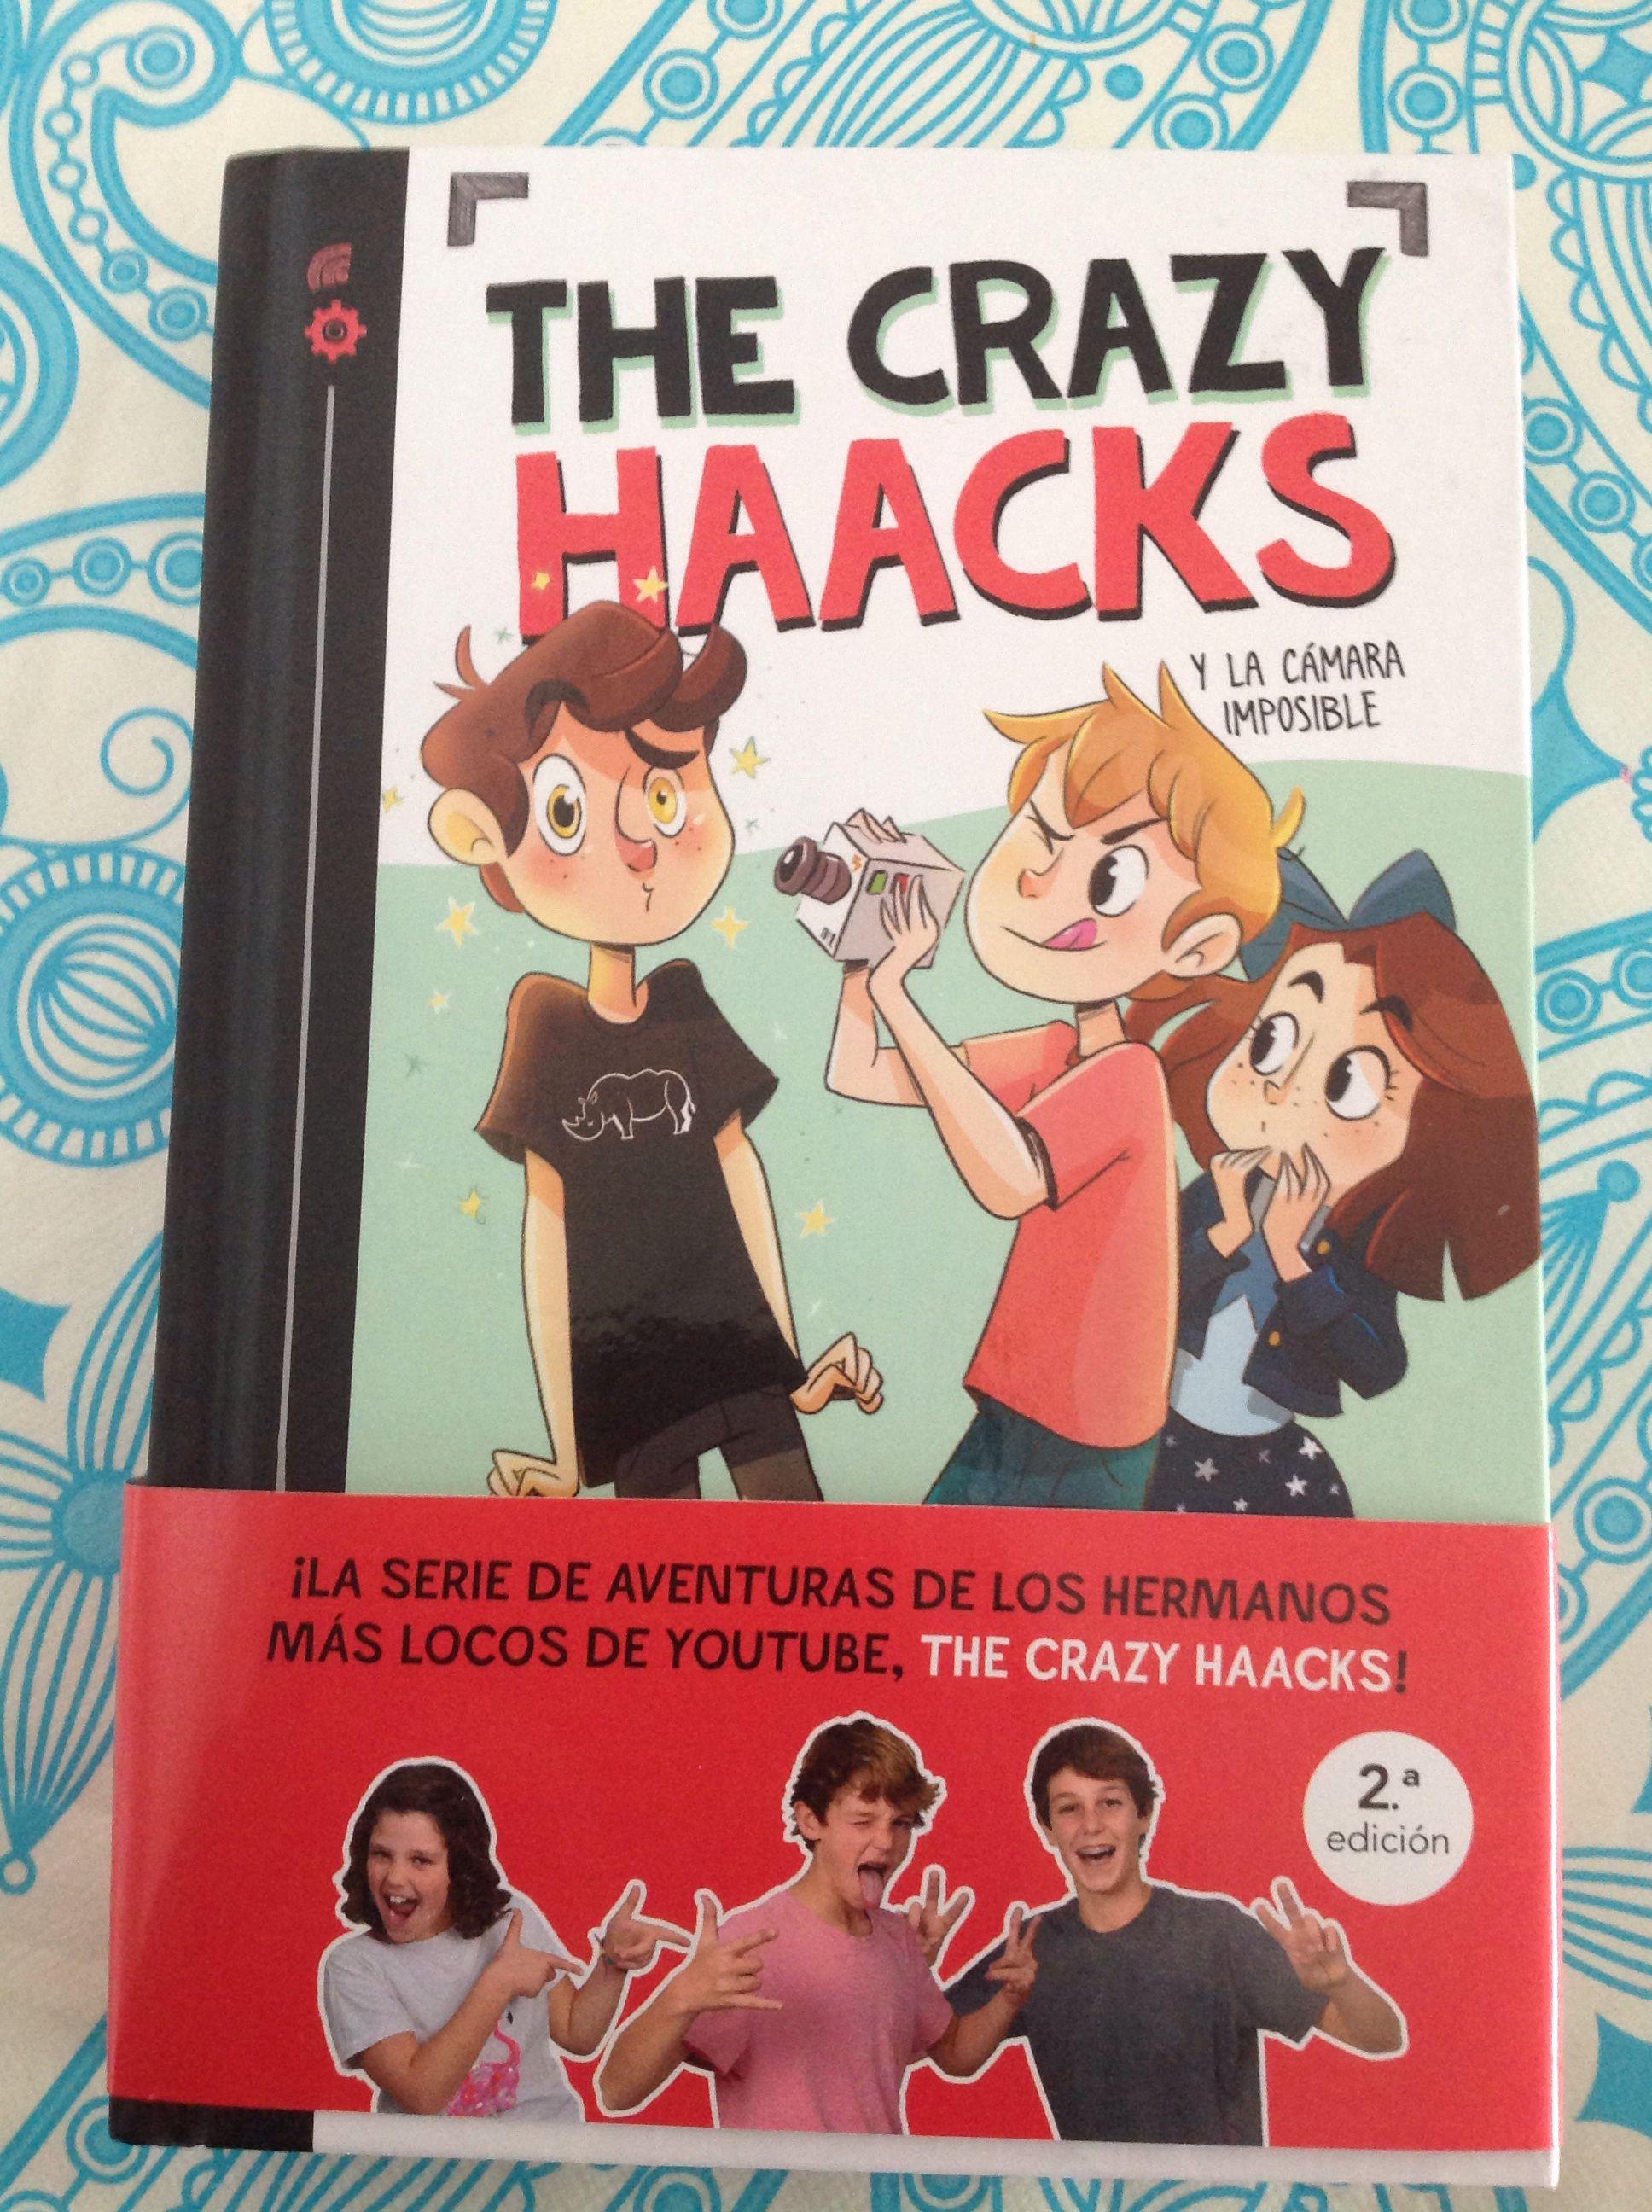 Pin de Bianca Enrique en te crazy Haacks | Libros, Libros para leer y Books  libros